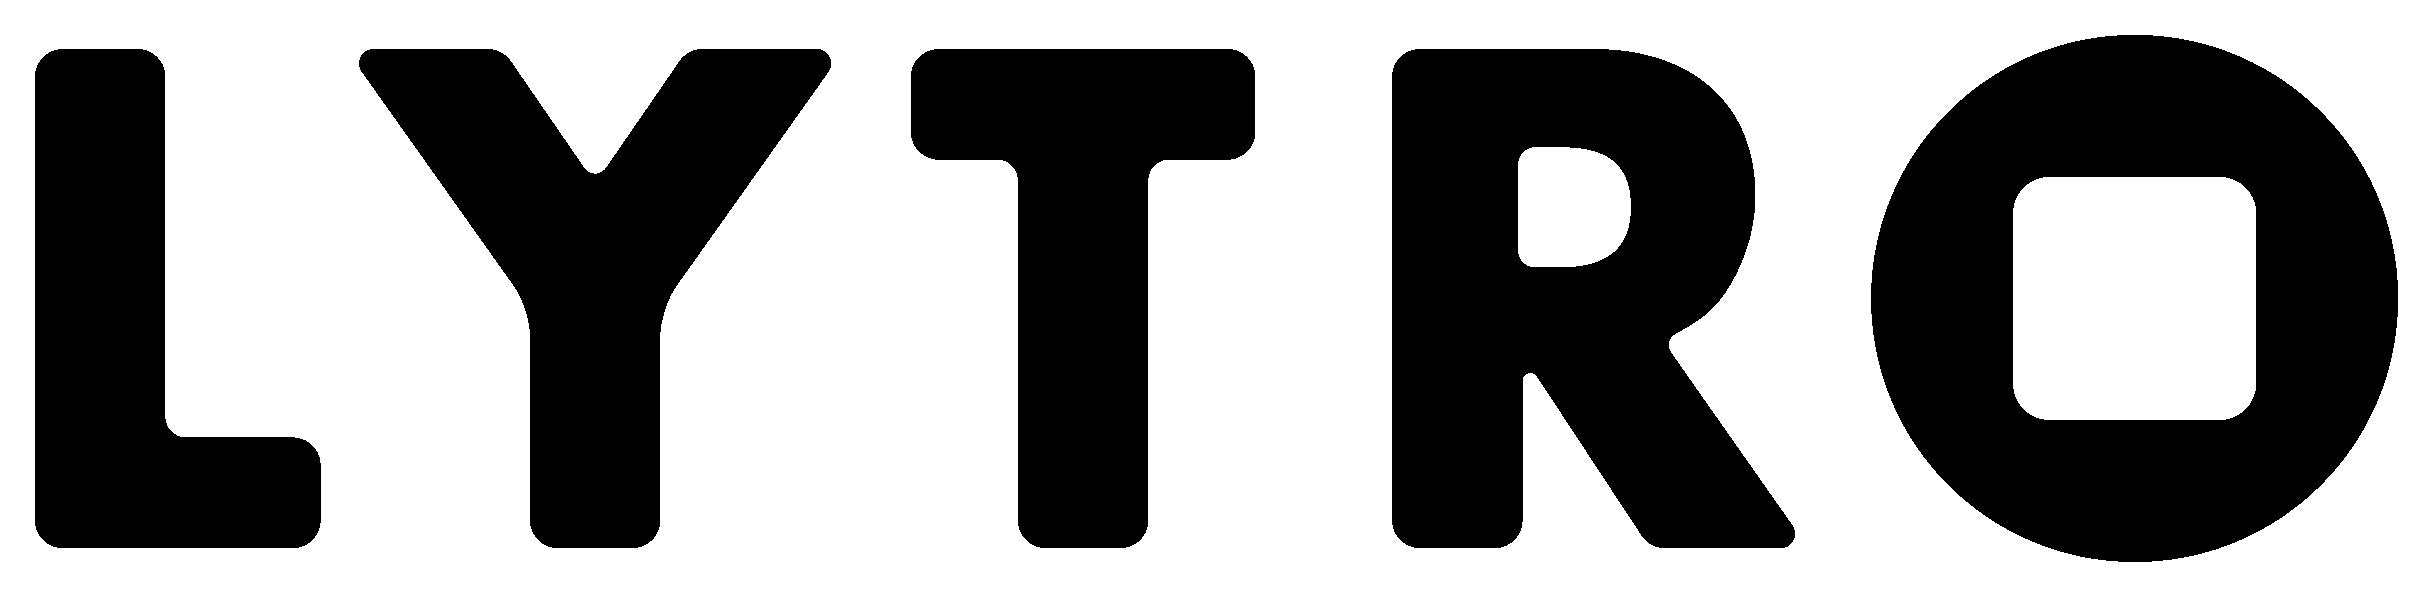 Logo_LYTRO_black-01.png